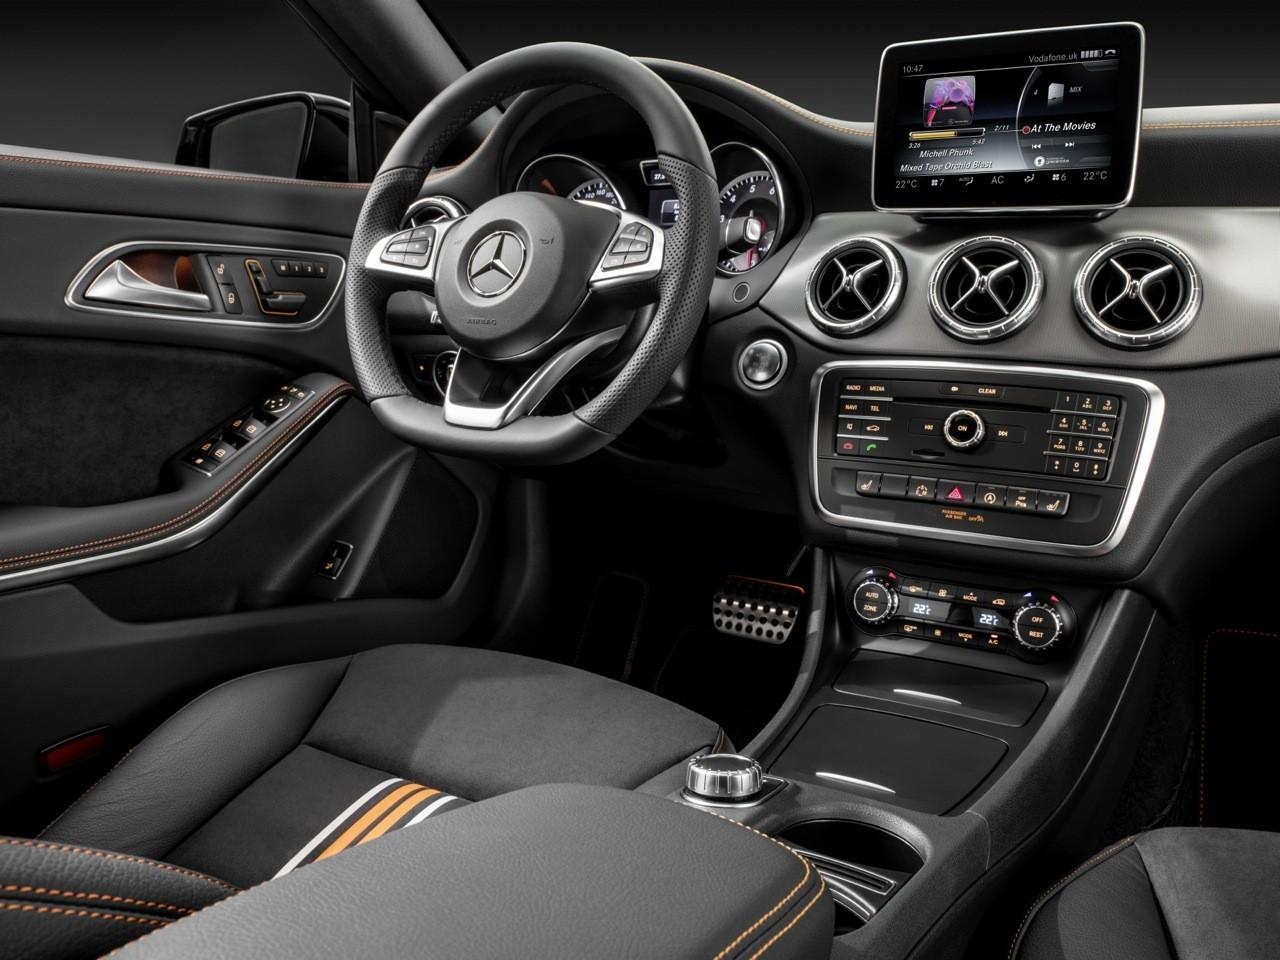 Mercedes Benz Cla Shooting Brake On Sale In Australia From 52 400 Performancedrive